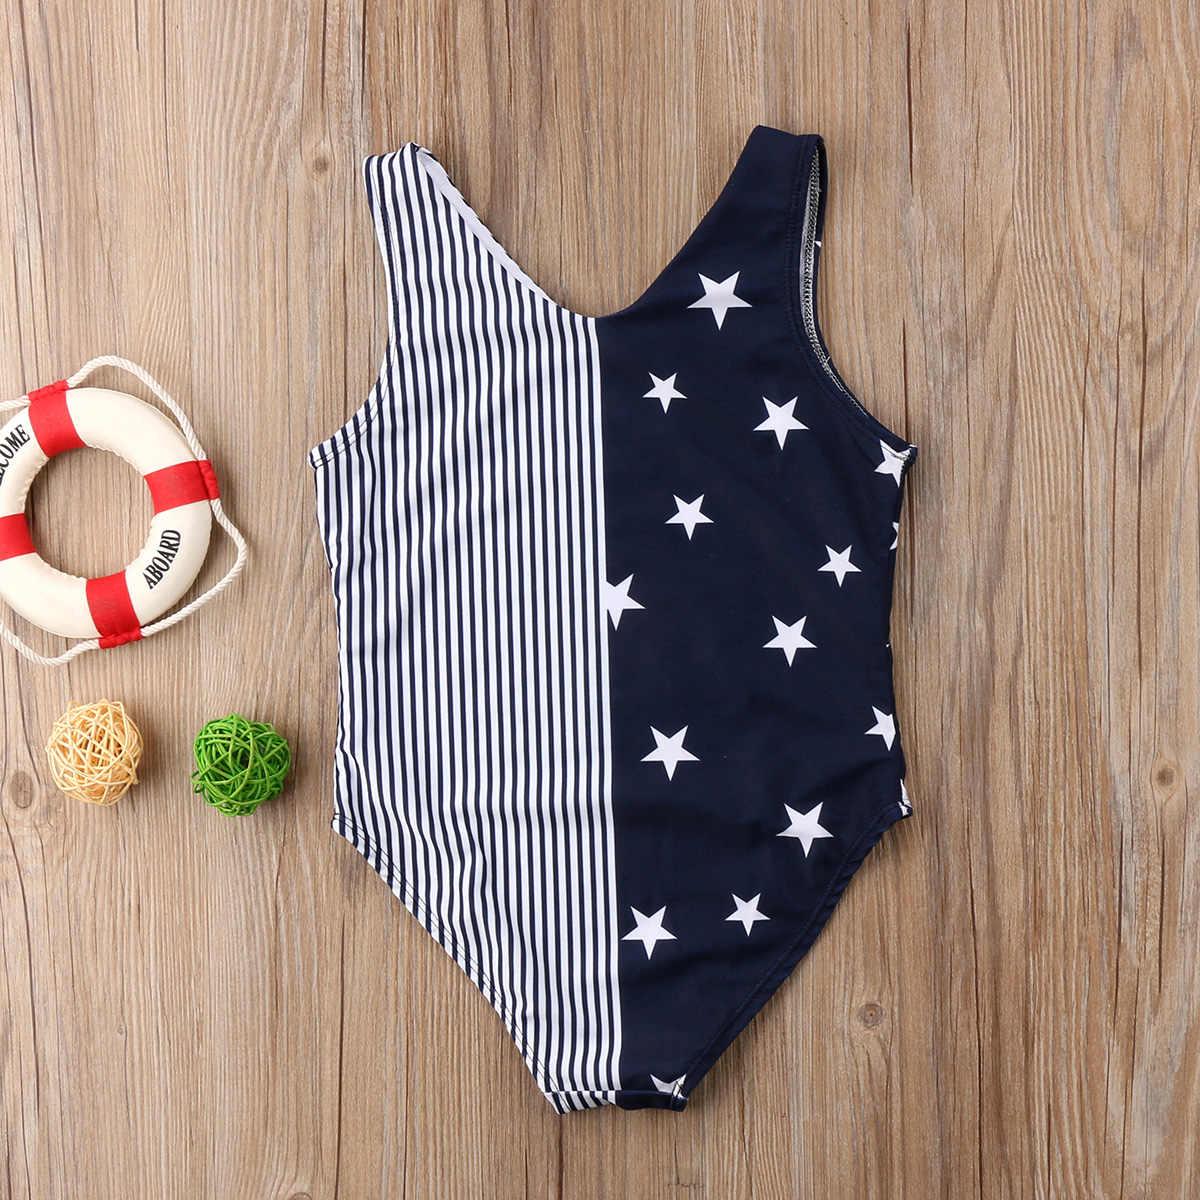 99d62ac1895 ... Mom Girl Matching One-piece Swimsuit Ladies Girls Stars Striped  Swimwear Swimsuits Bikini Beach Costume ...